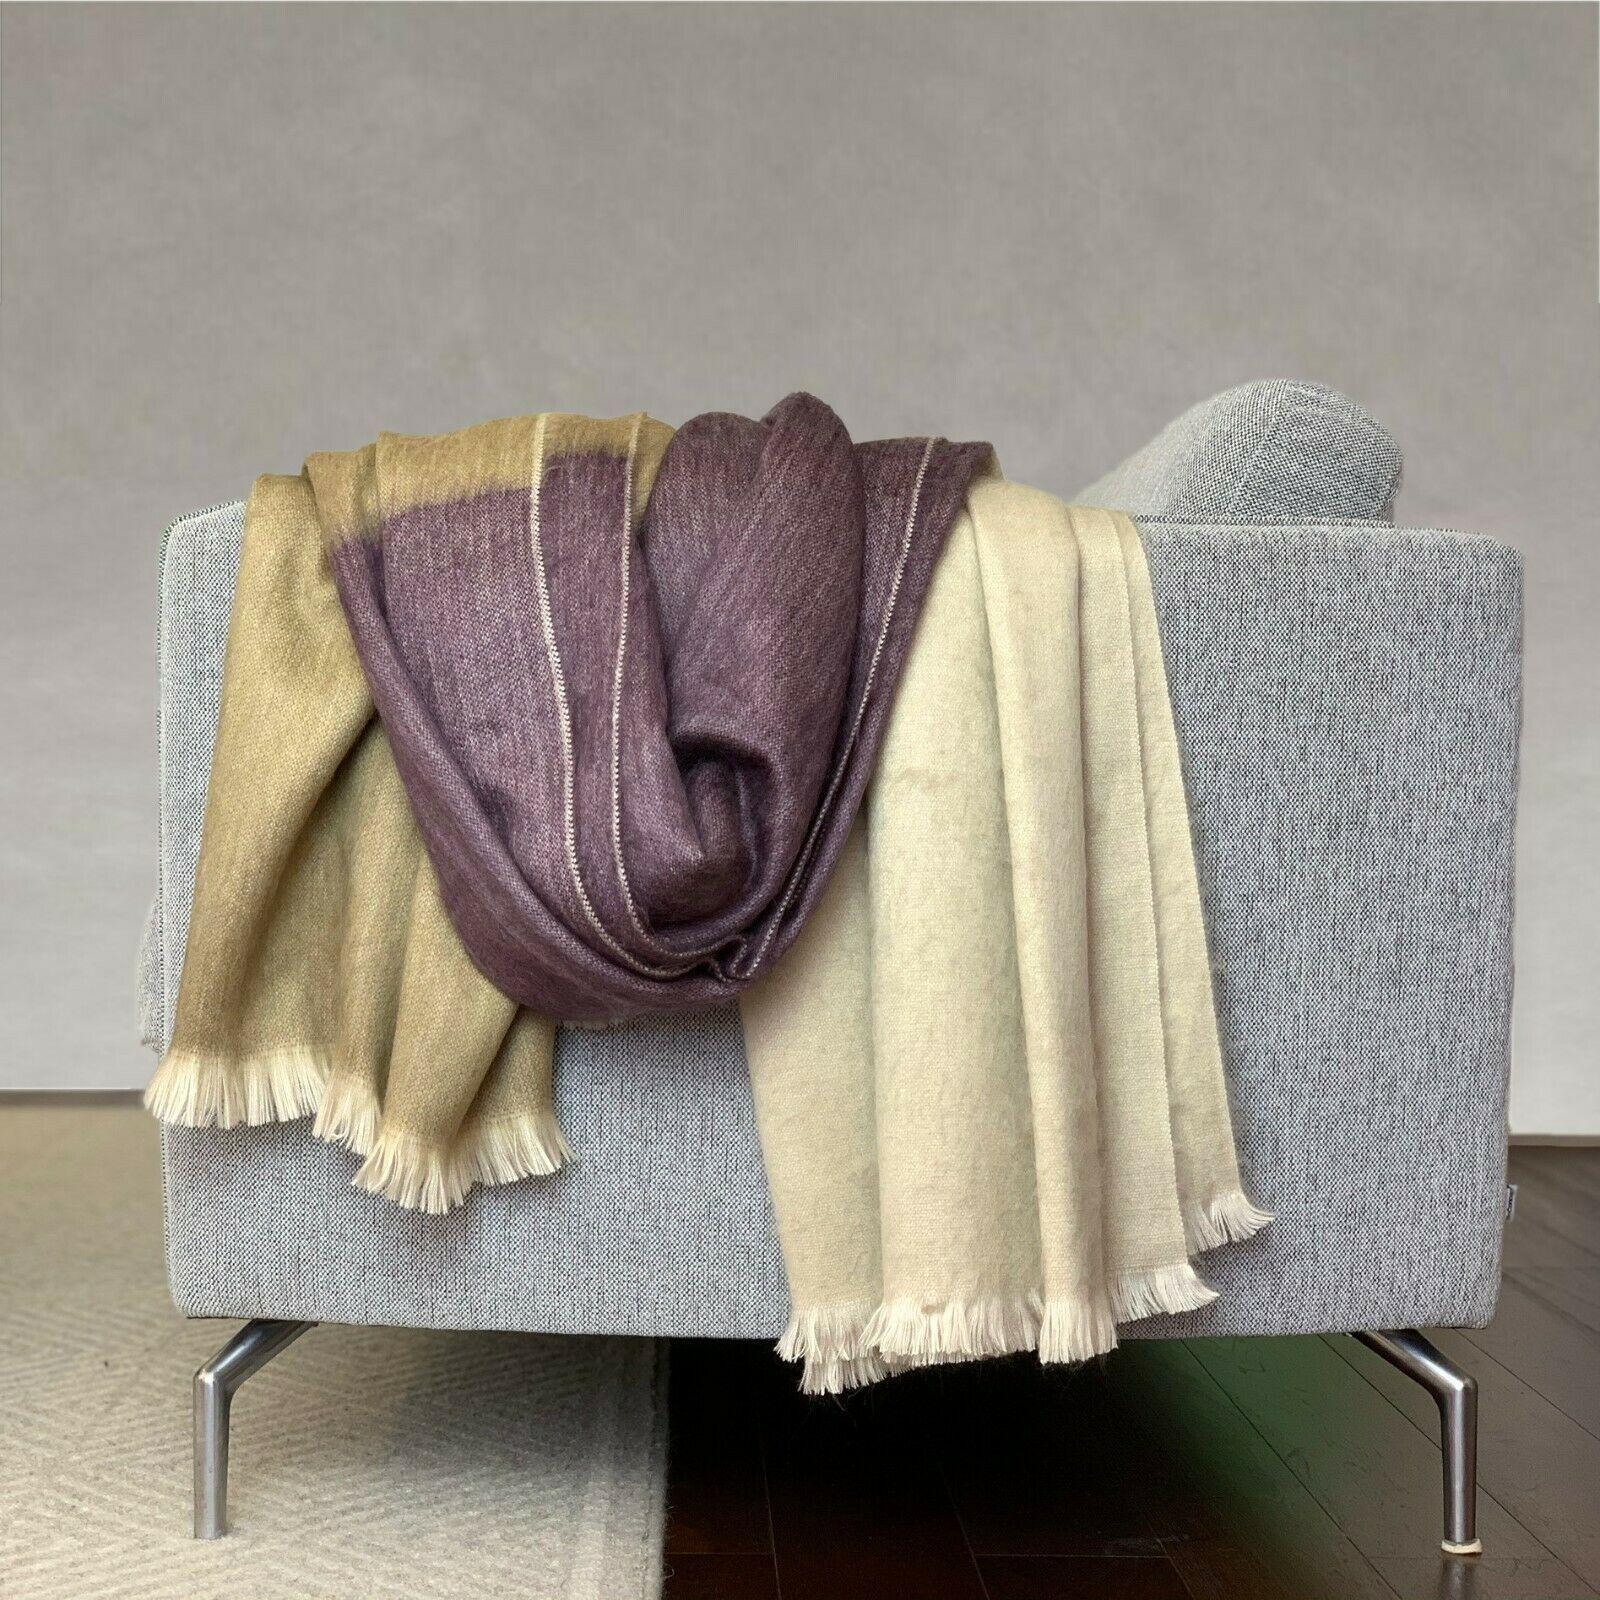 Alpaca Wool Throw Blanket Fringe Soft & Warm for Comfort & Style QUEEN 95x65 in - $69.25